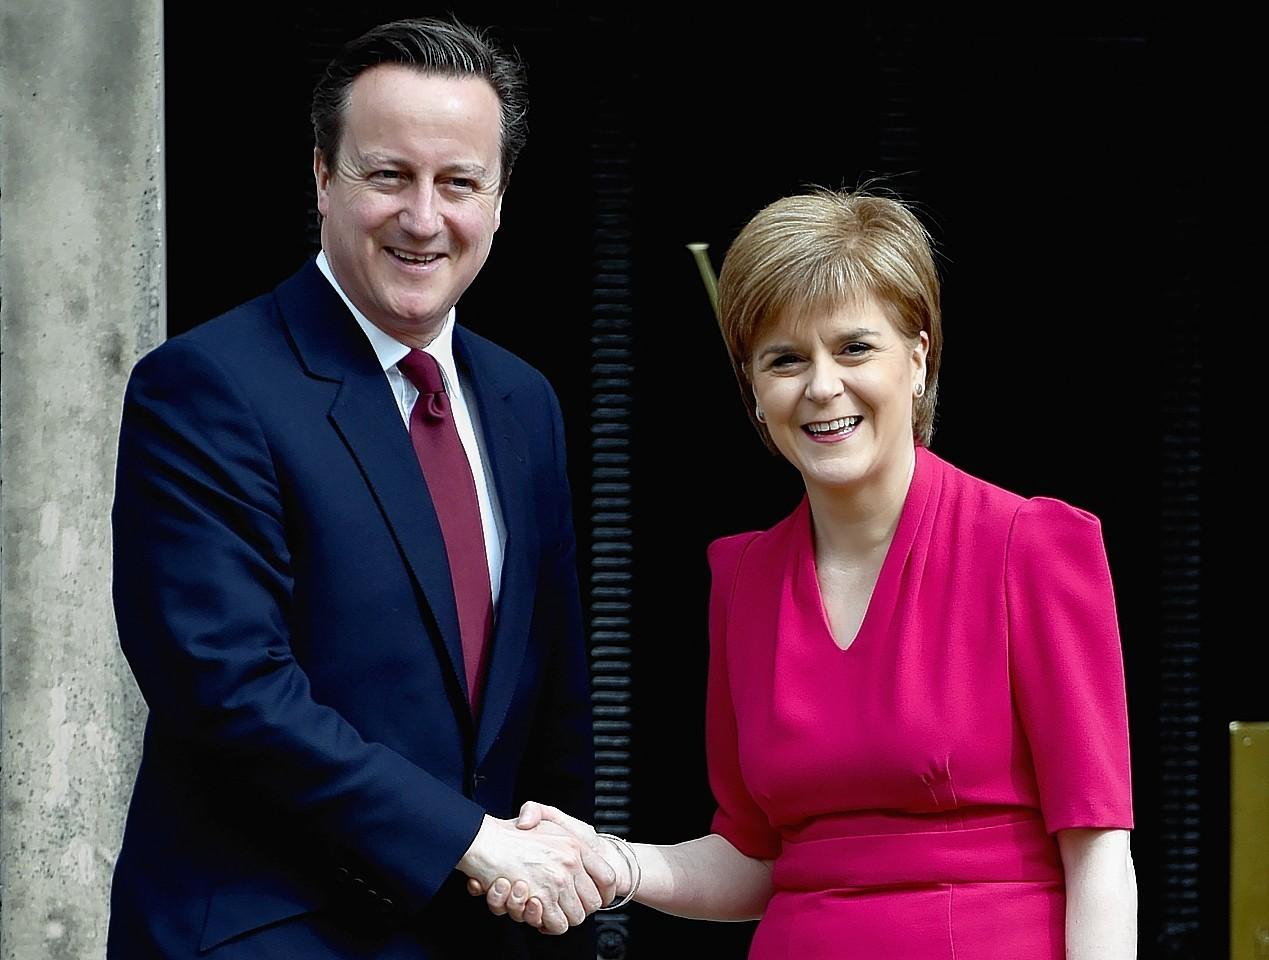 David Cameron meets with Nicola Sturgeon at Bute House